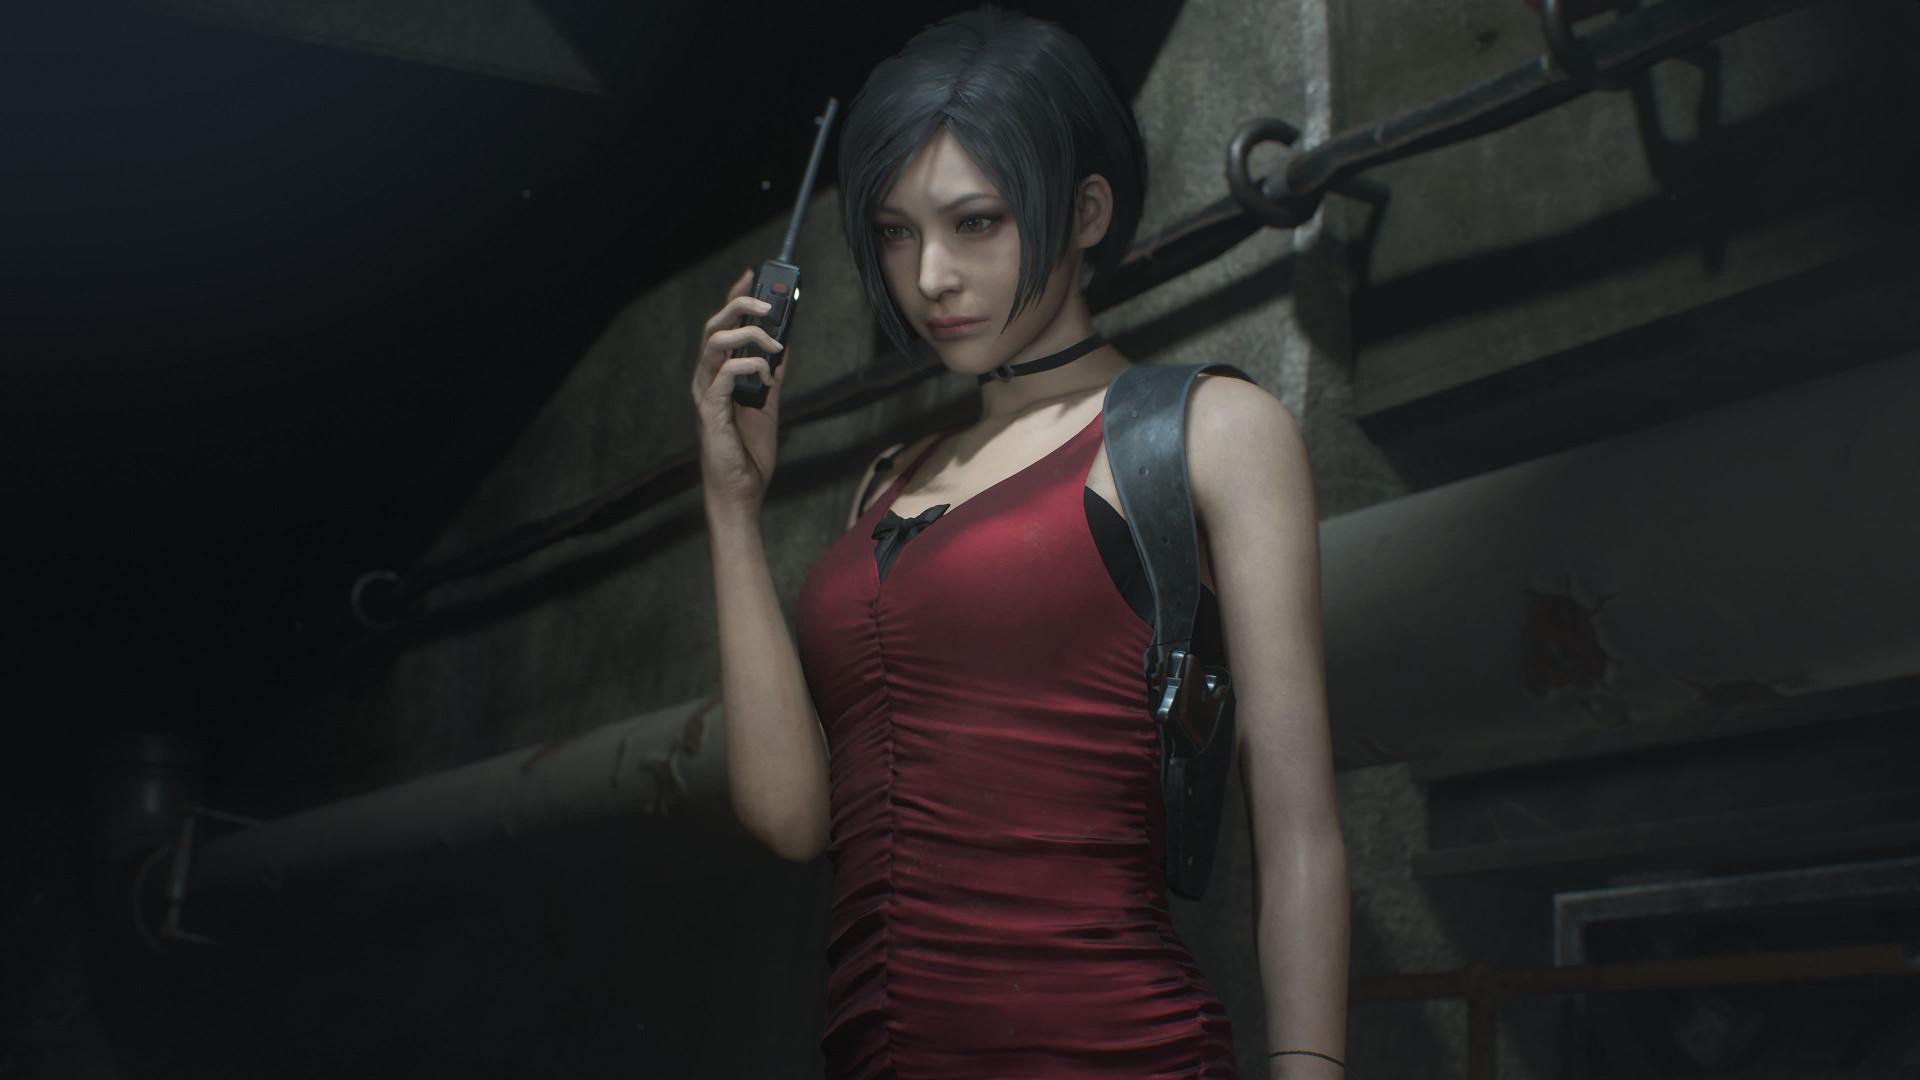 Разработчики Resident Evil 2 Remake покажут много нового контента за 3 дня до релиза